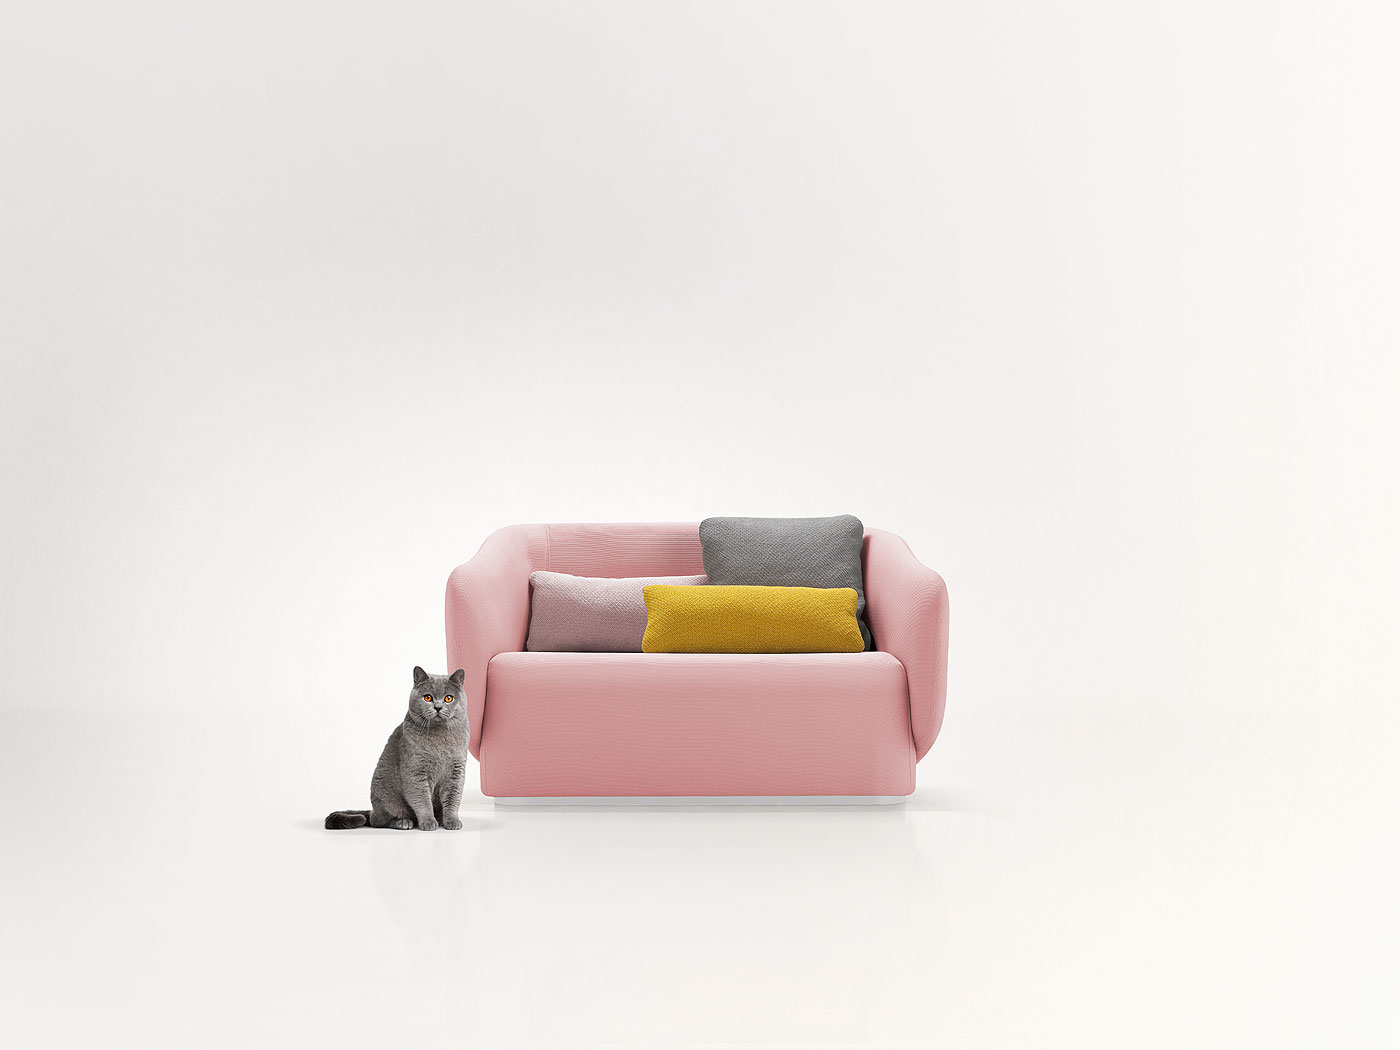 sofa-yon-pau-design-lavernia-cienfuegos (4)